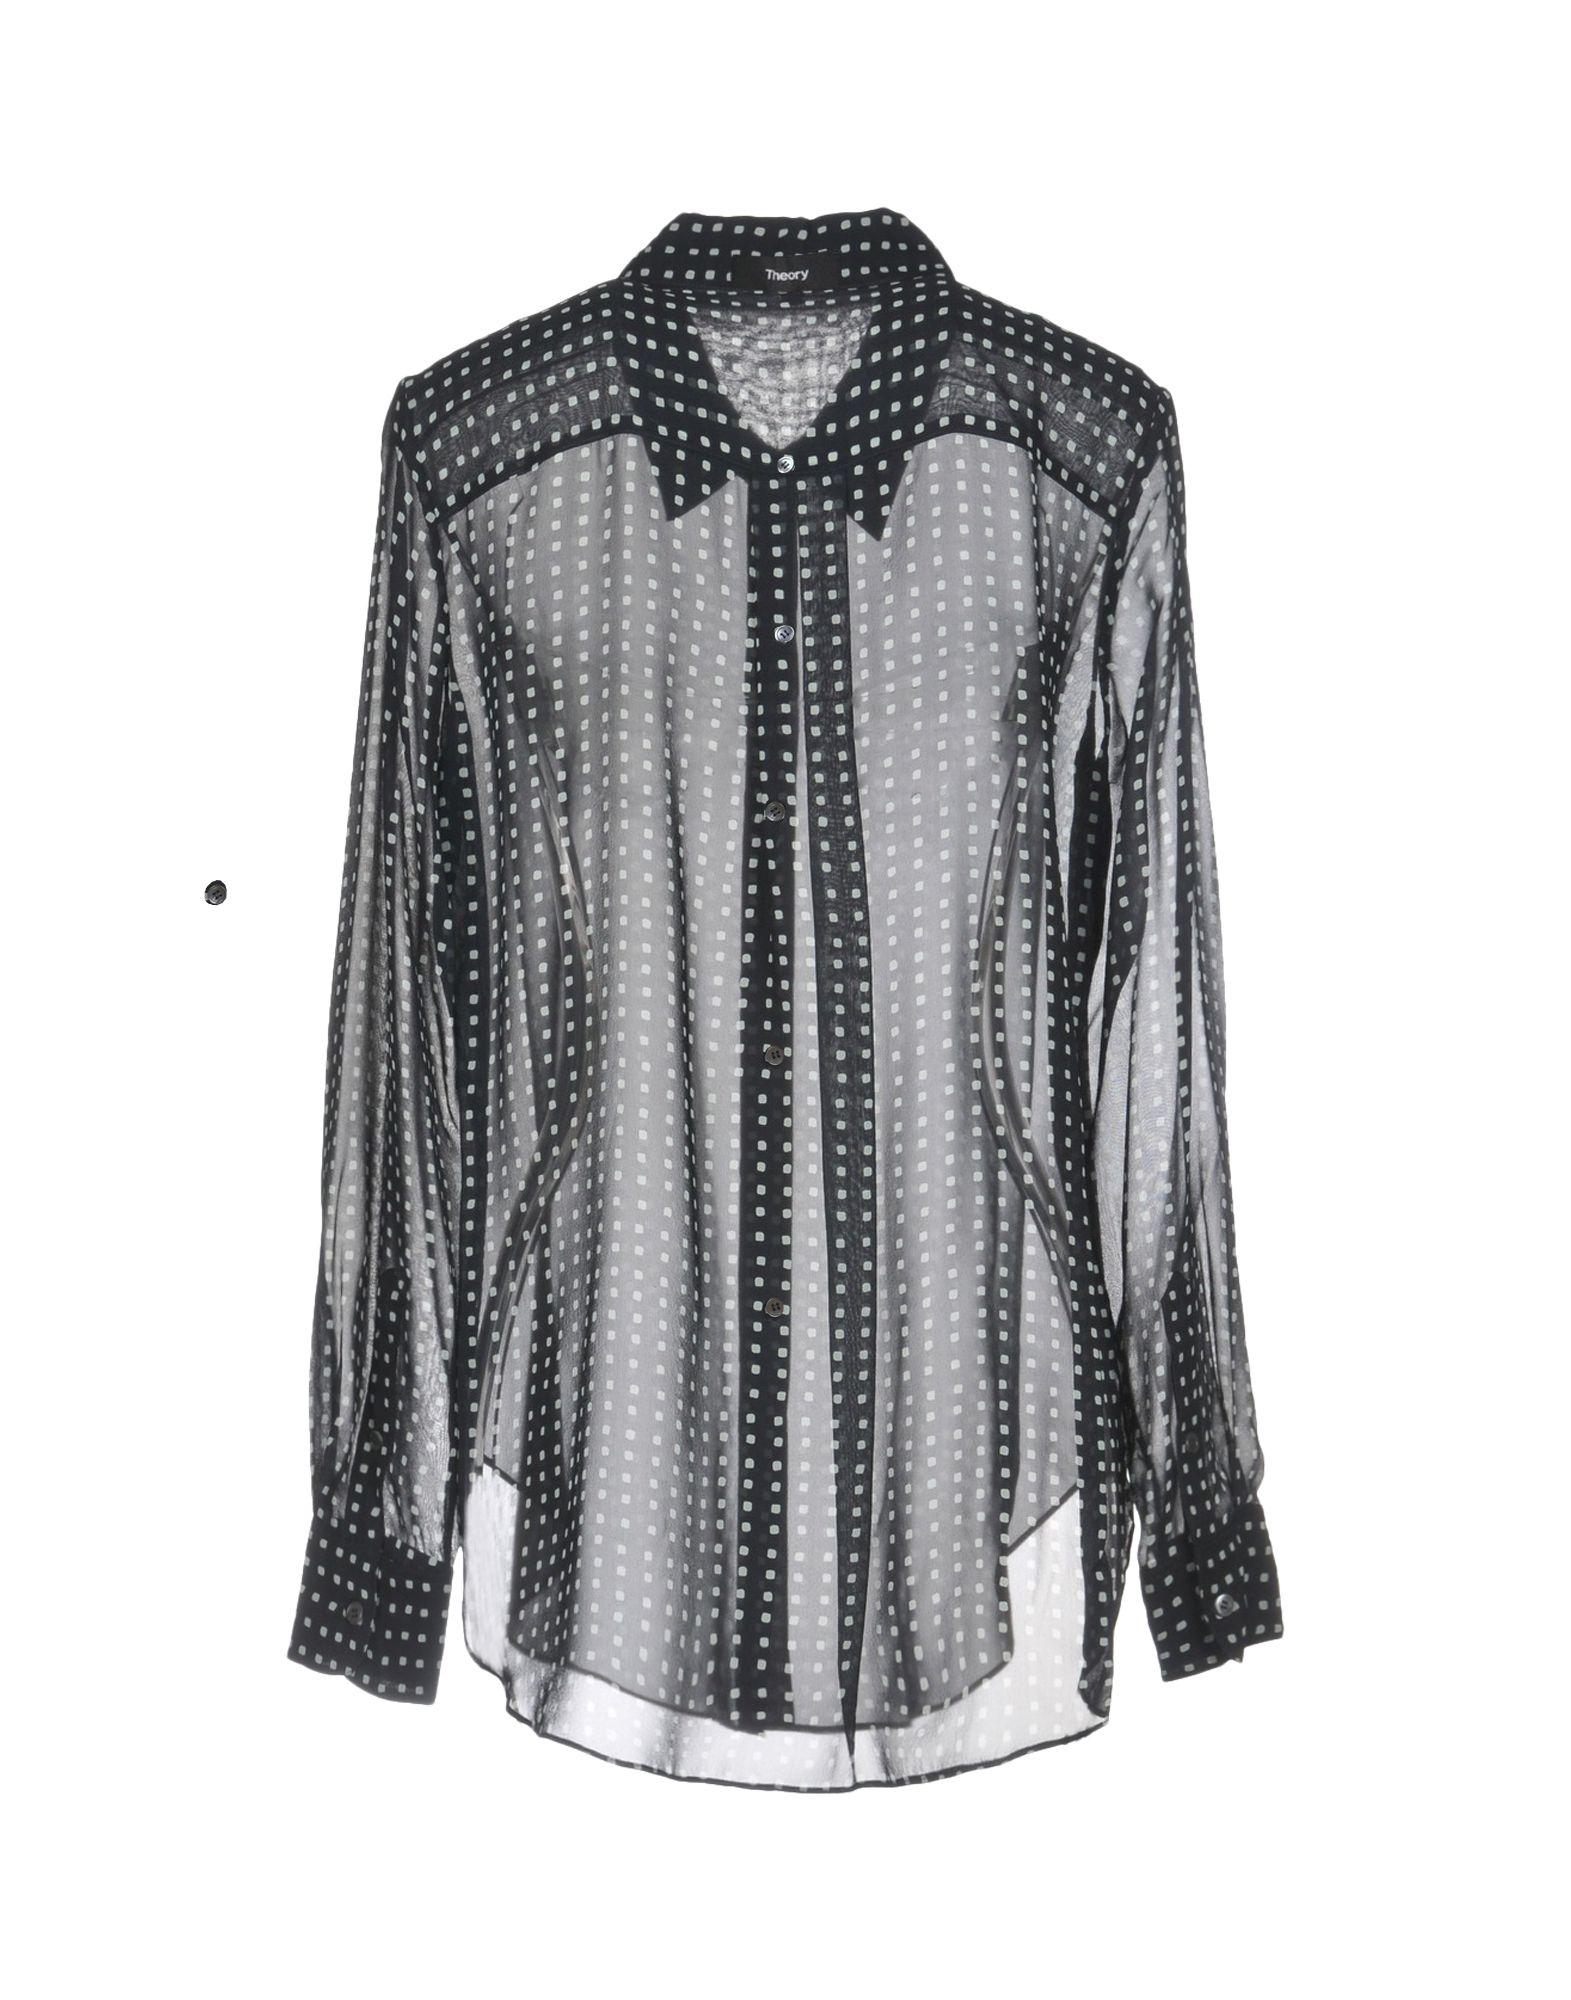 1714dbd504f Рубашки И Блузки С Рисунком Для Женщин от Theory - YOOX Россия